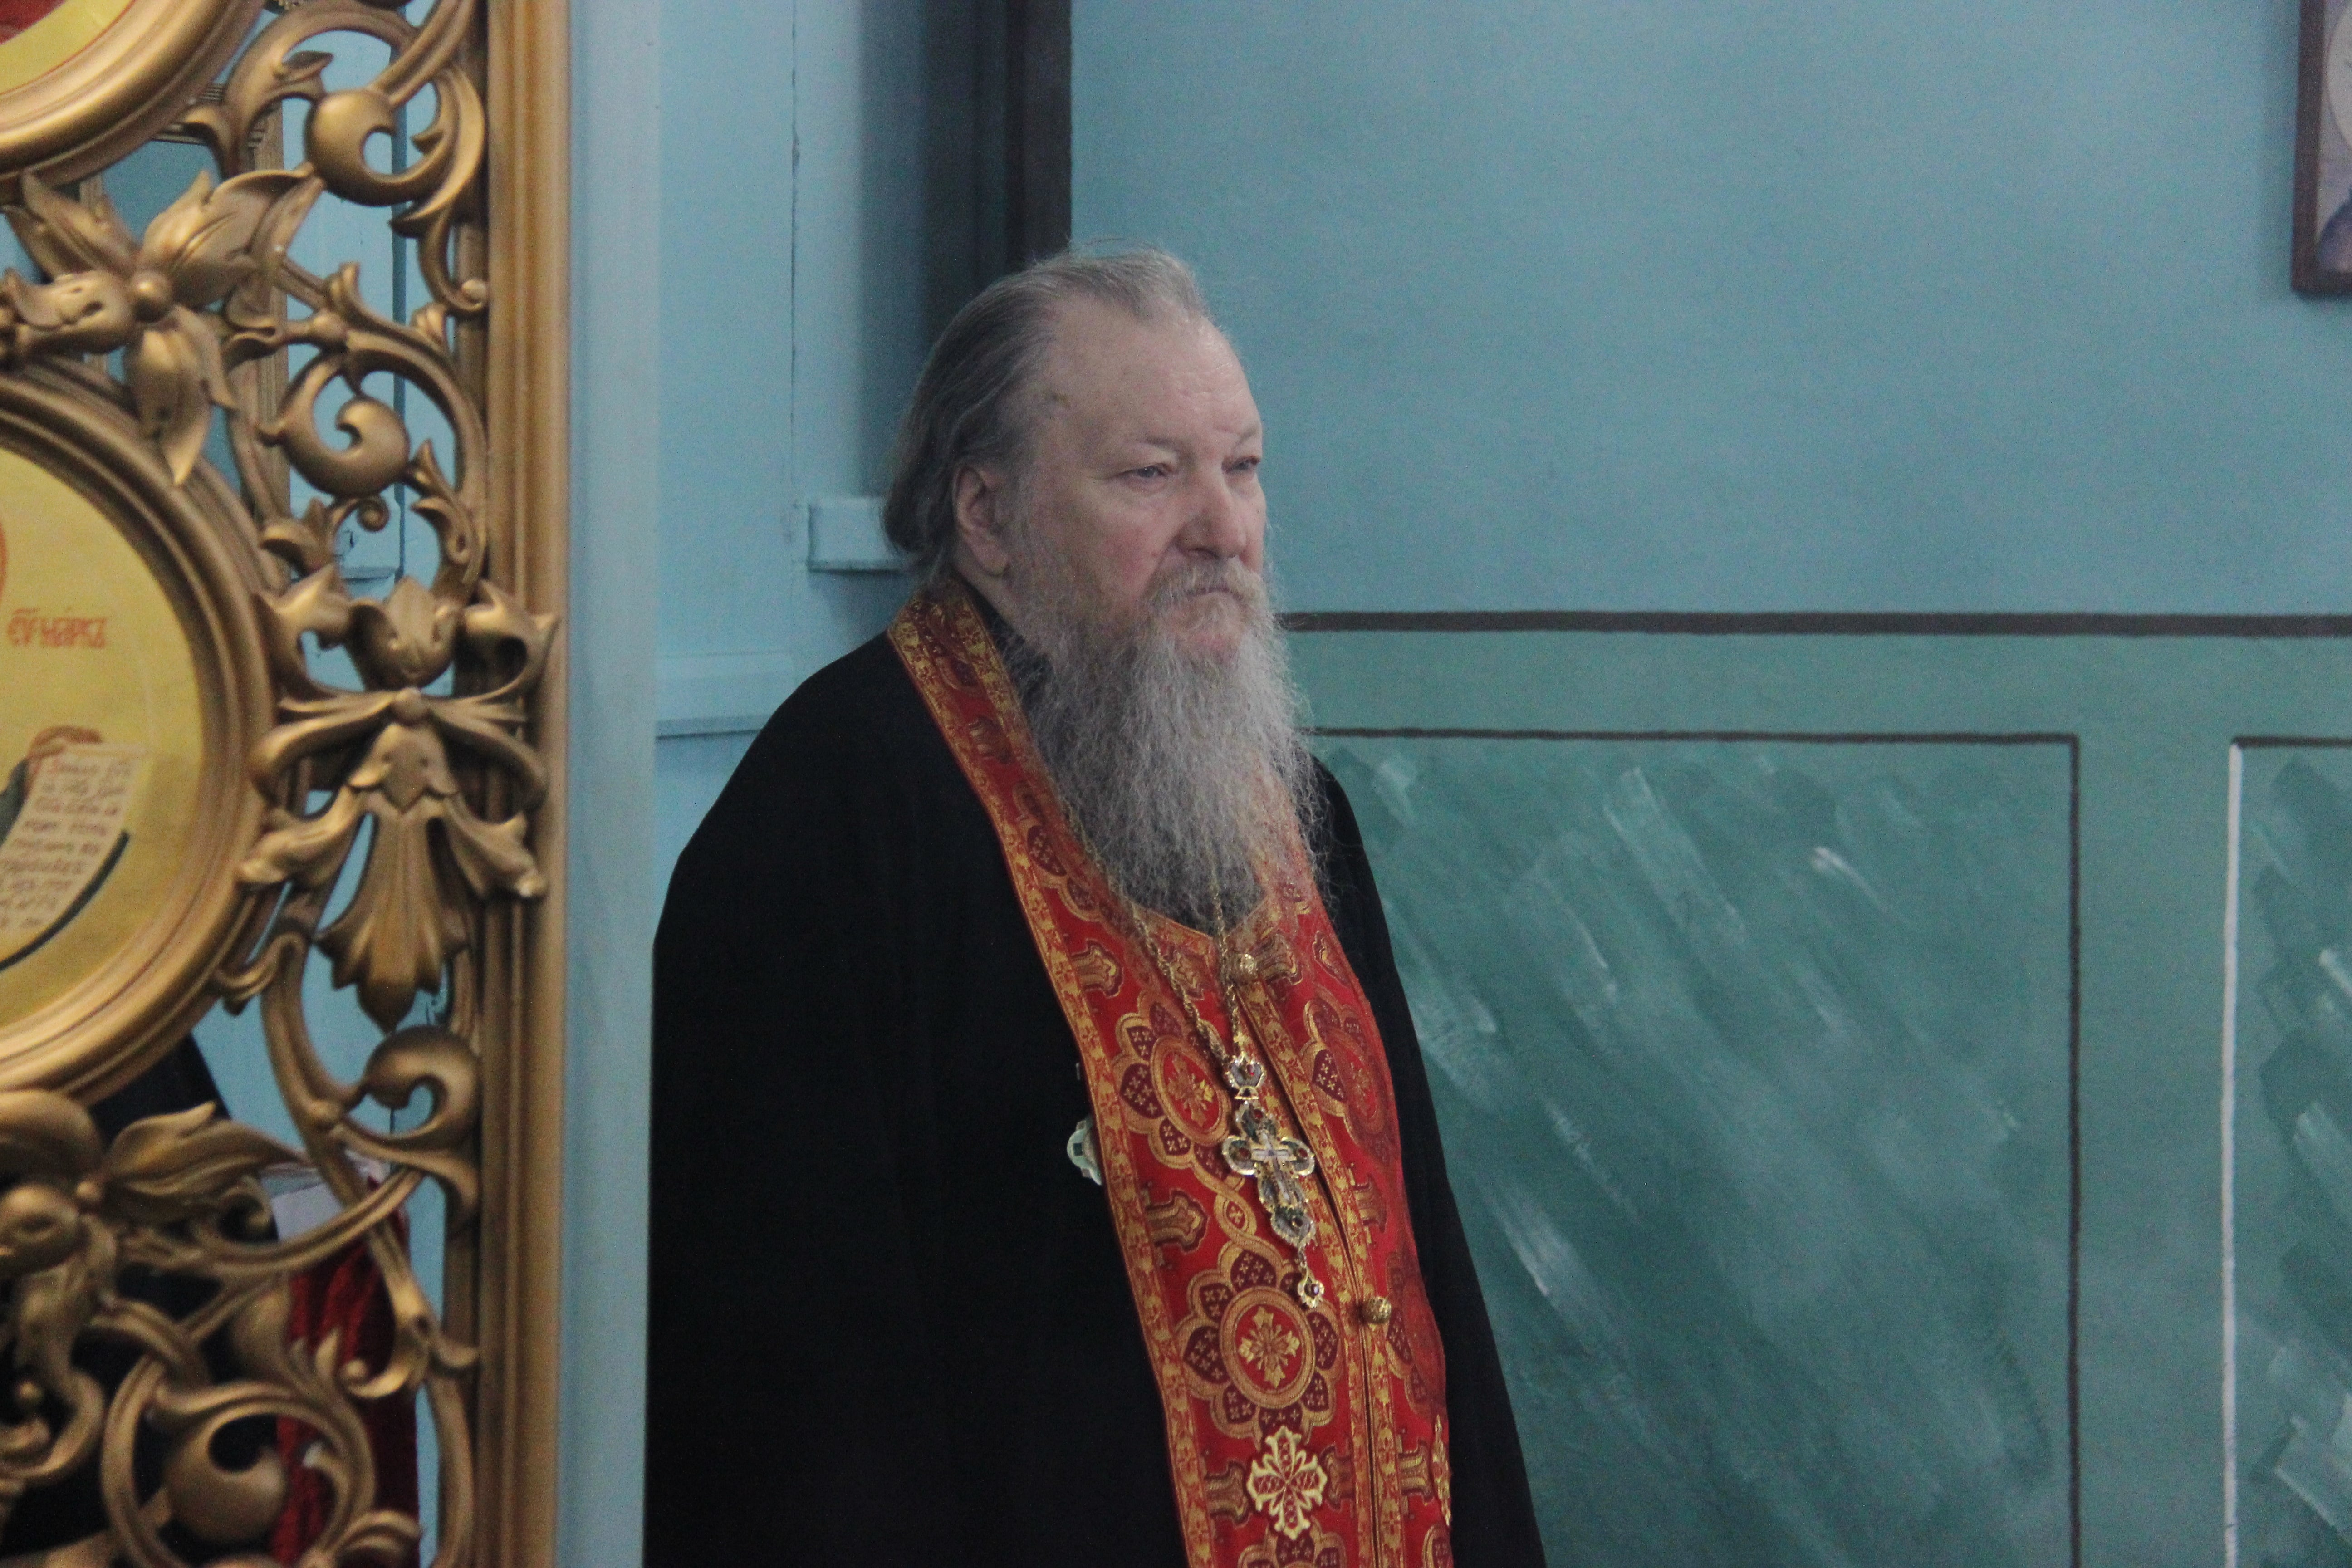 http://monuspen.ru/photoreports/761cedcebac14ed511129cb83b587d38.JPG